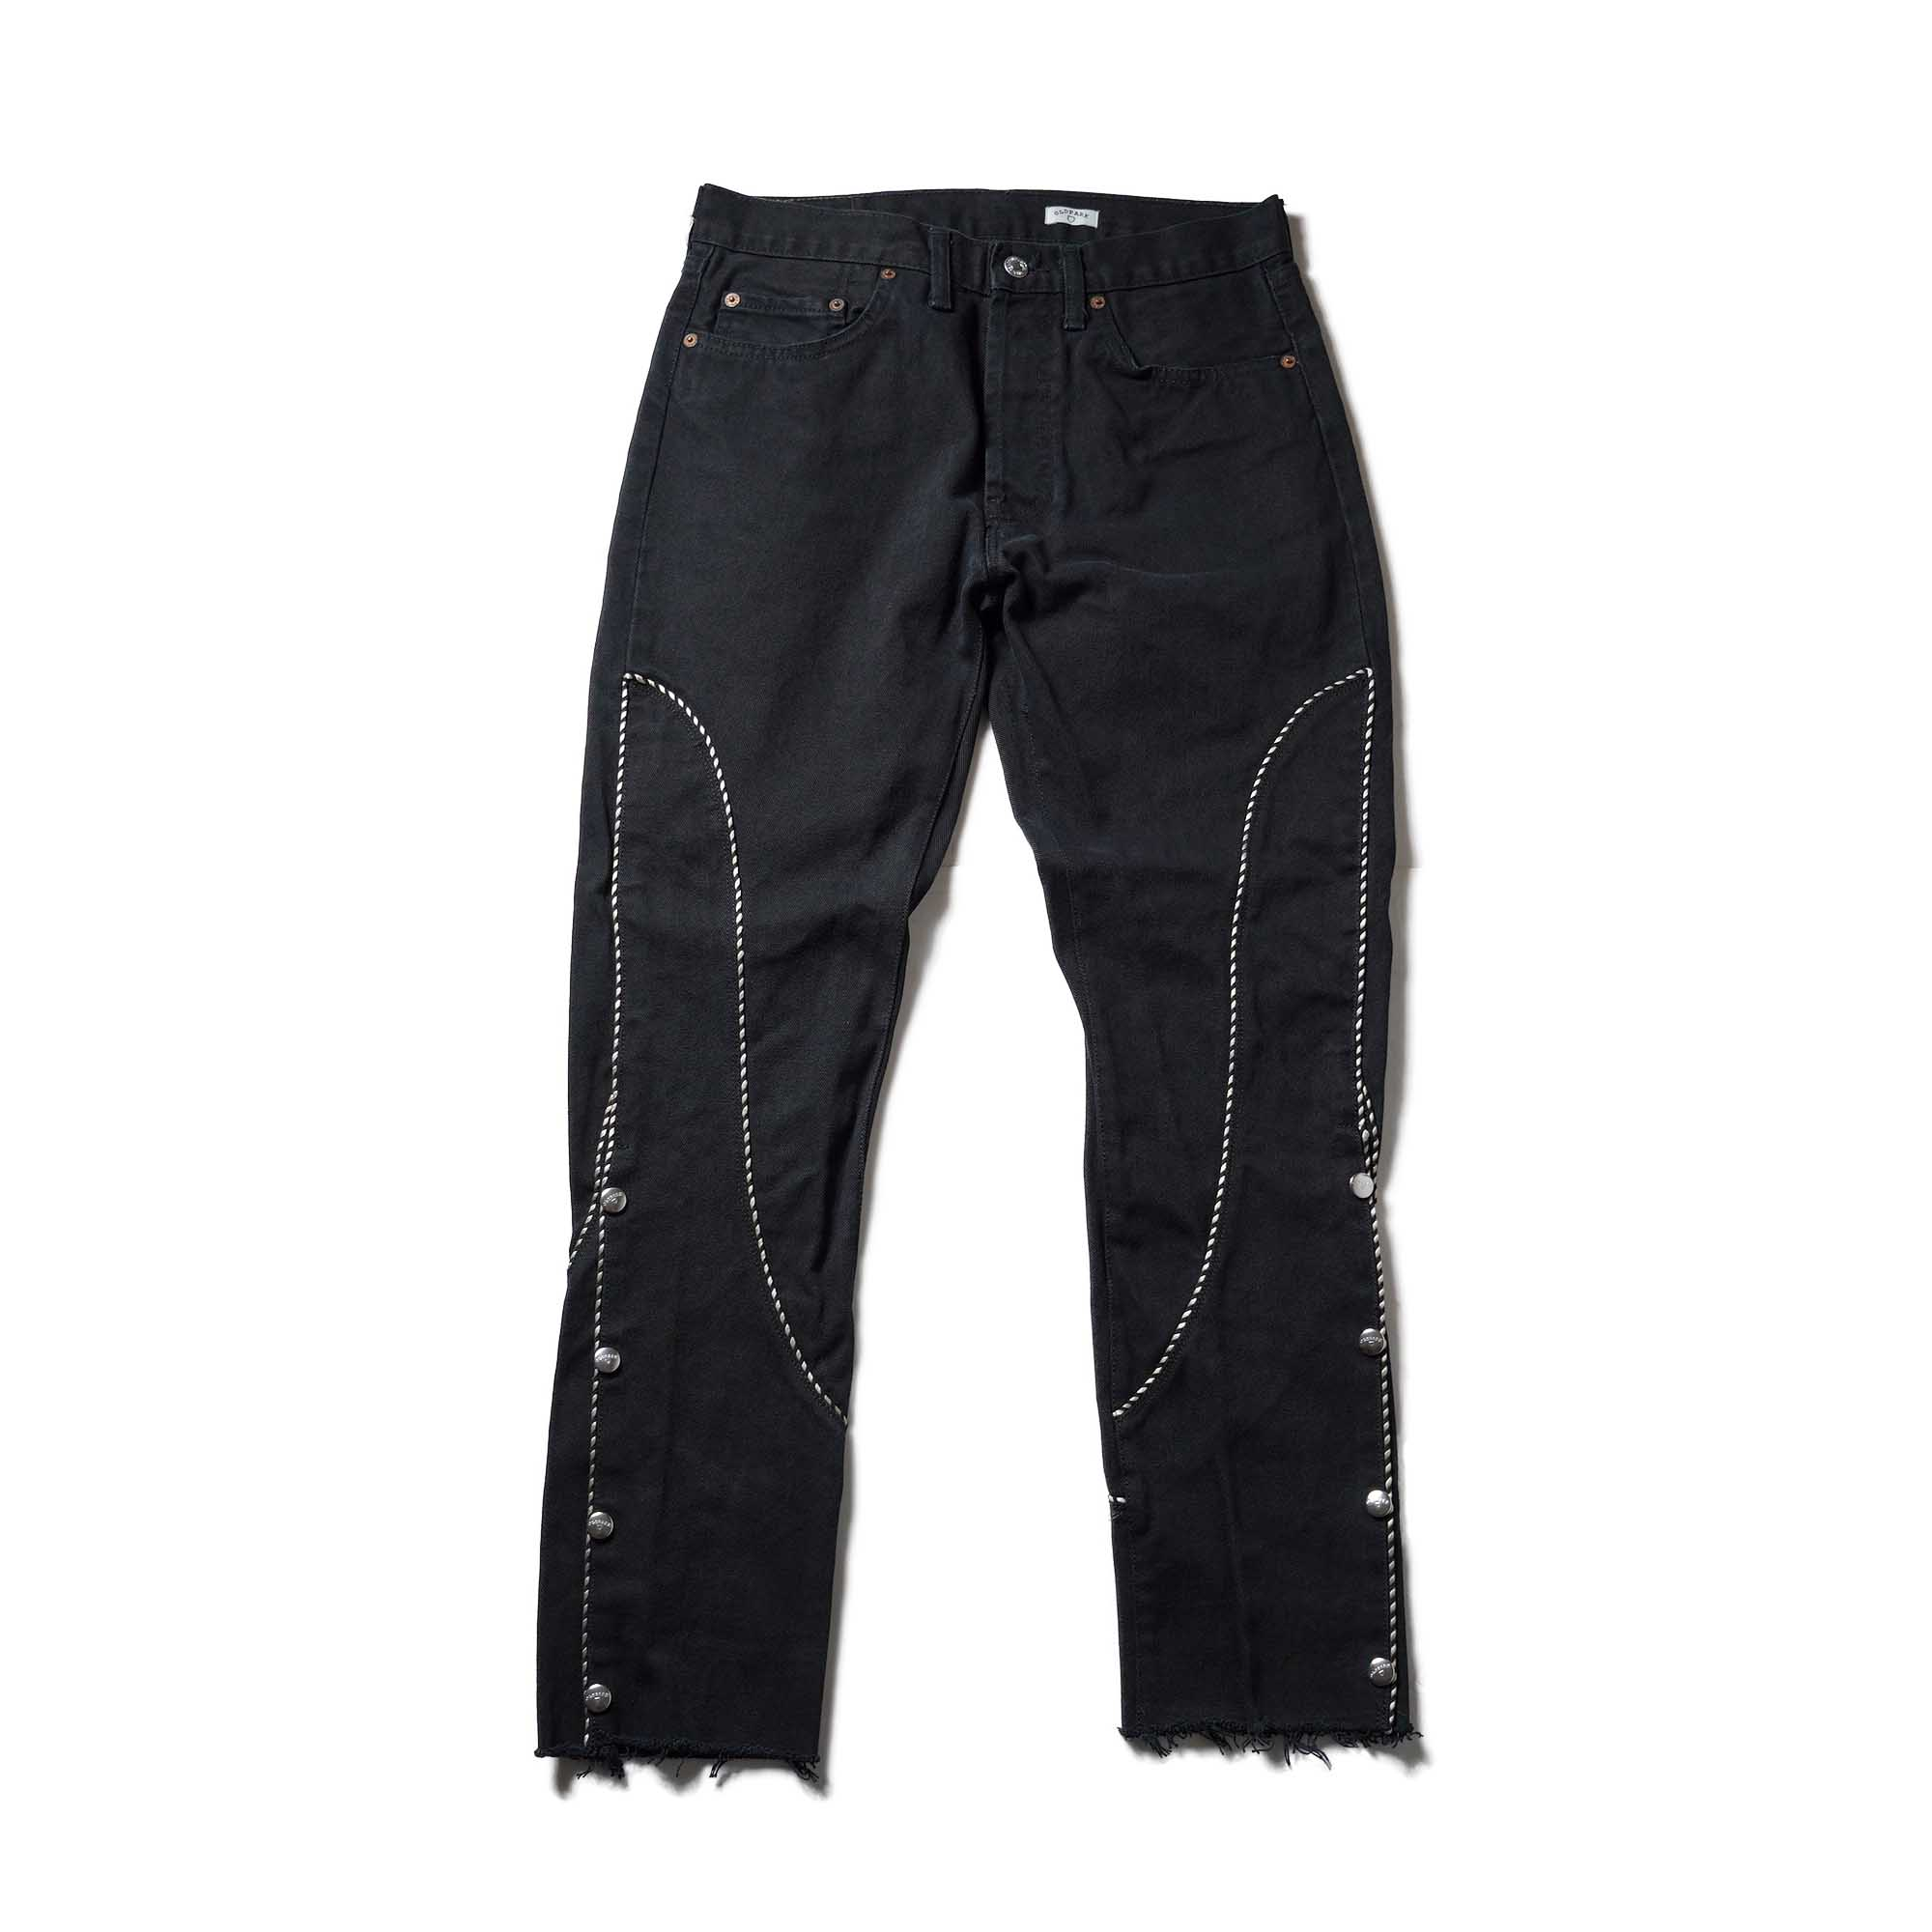 OLD PARK / Western Jeans2 Black (Msize-B)